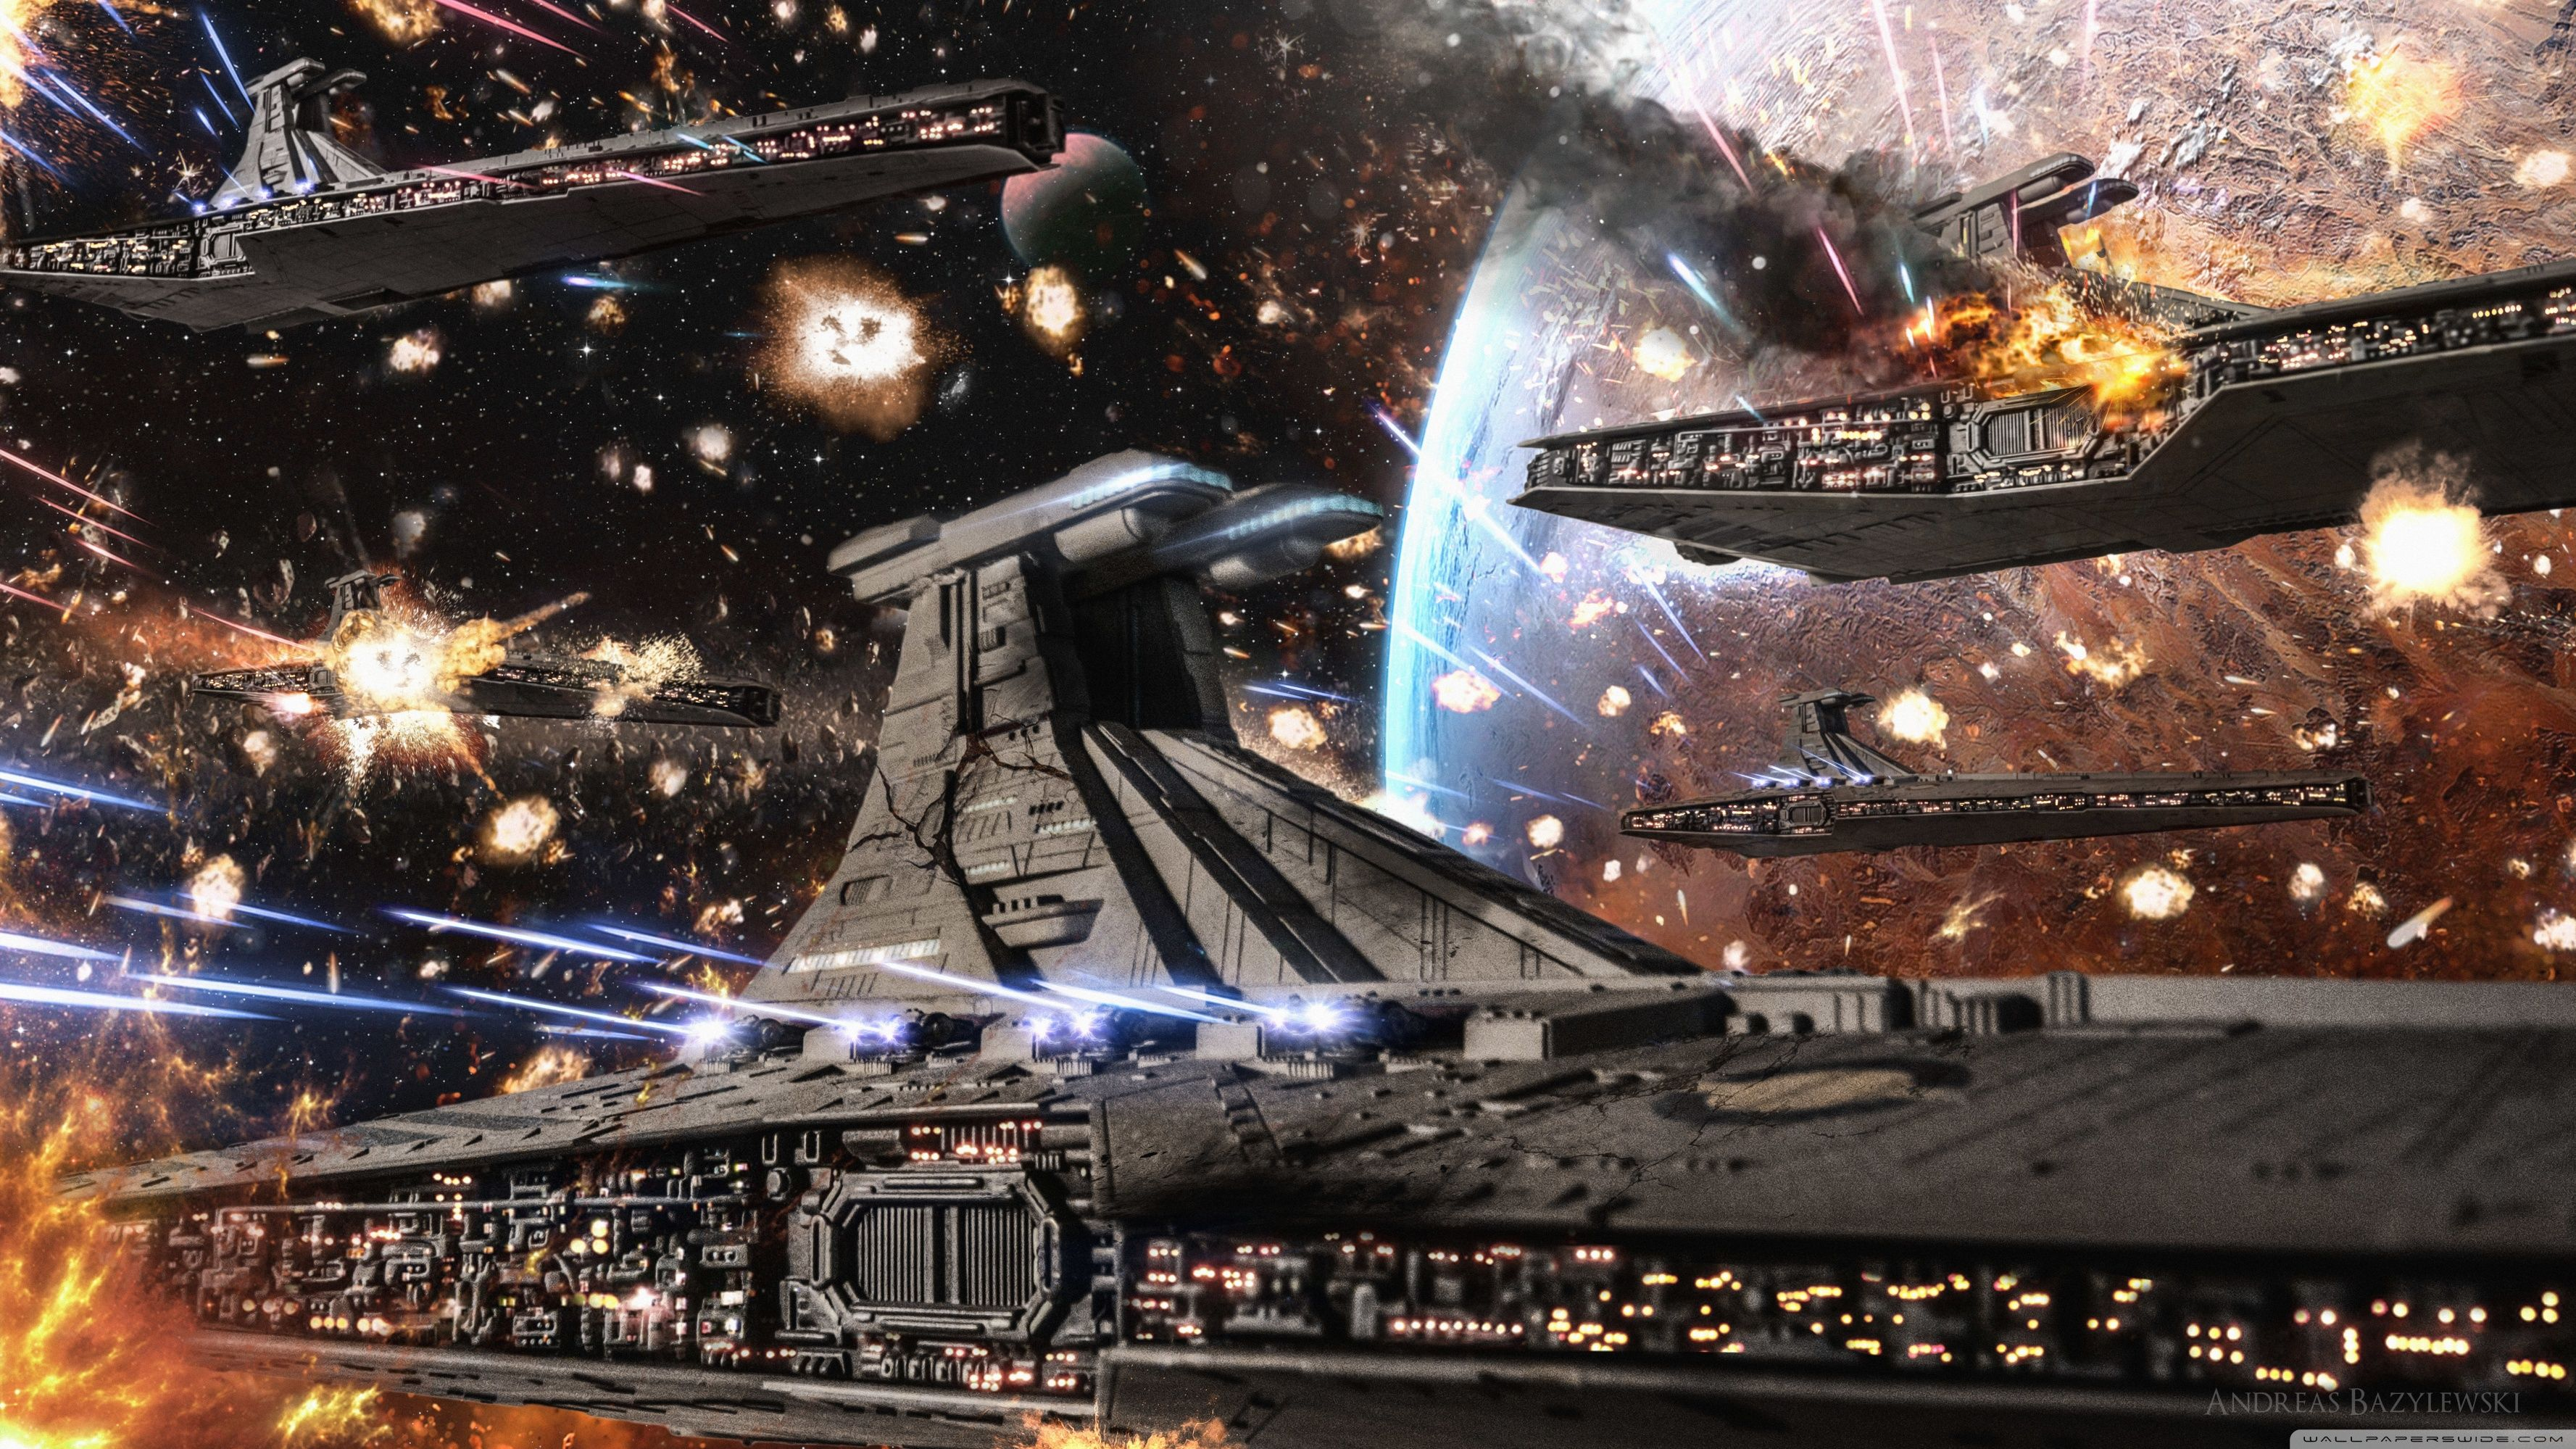 Republic Star Wars Phone Wallpapers Top Free Republic Star Wars Phone Backgrounds Wallpaperaccess